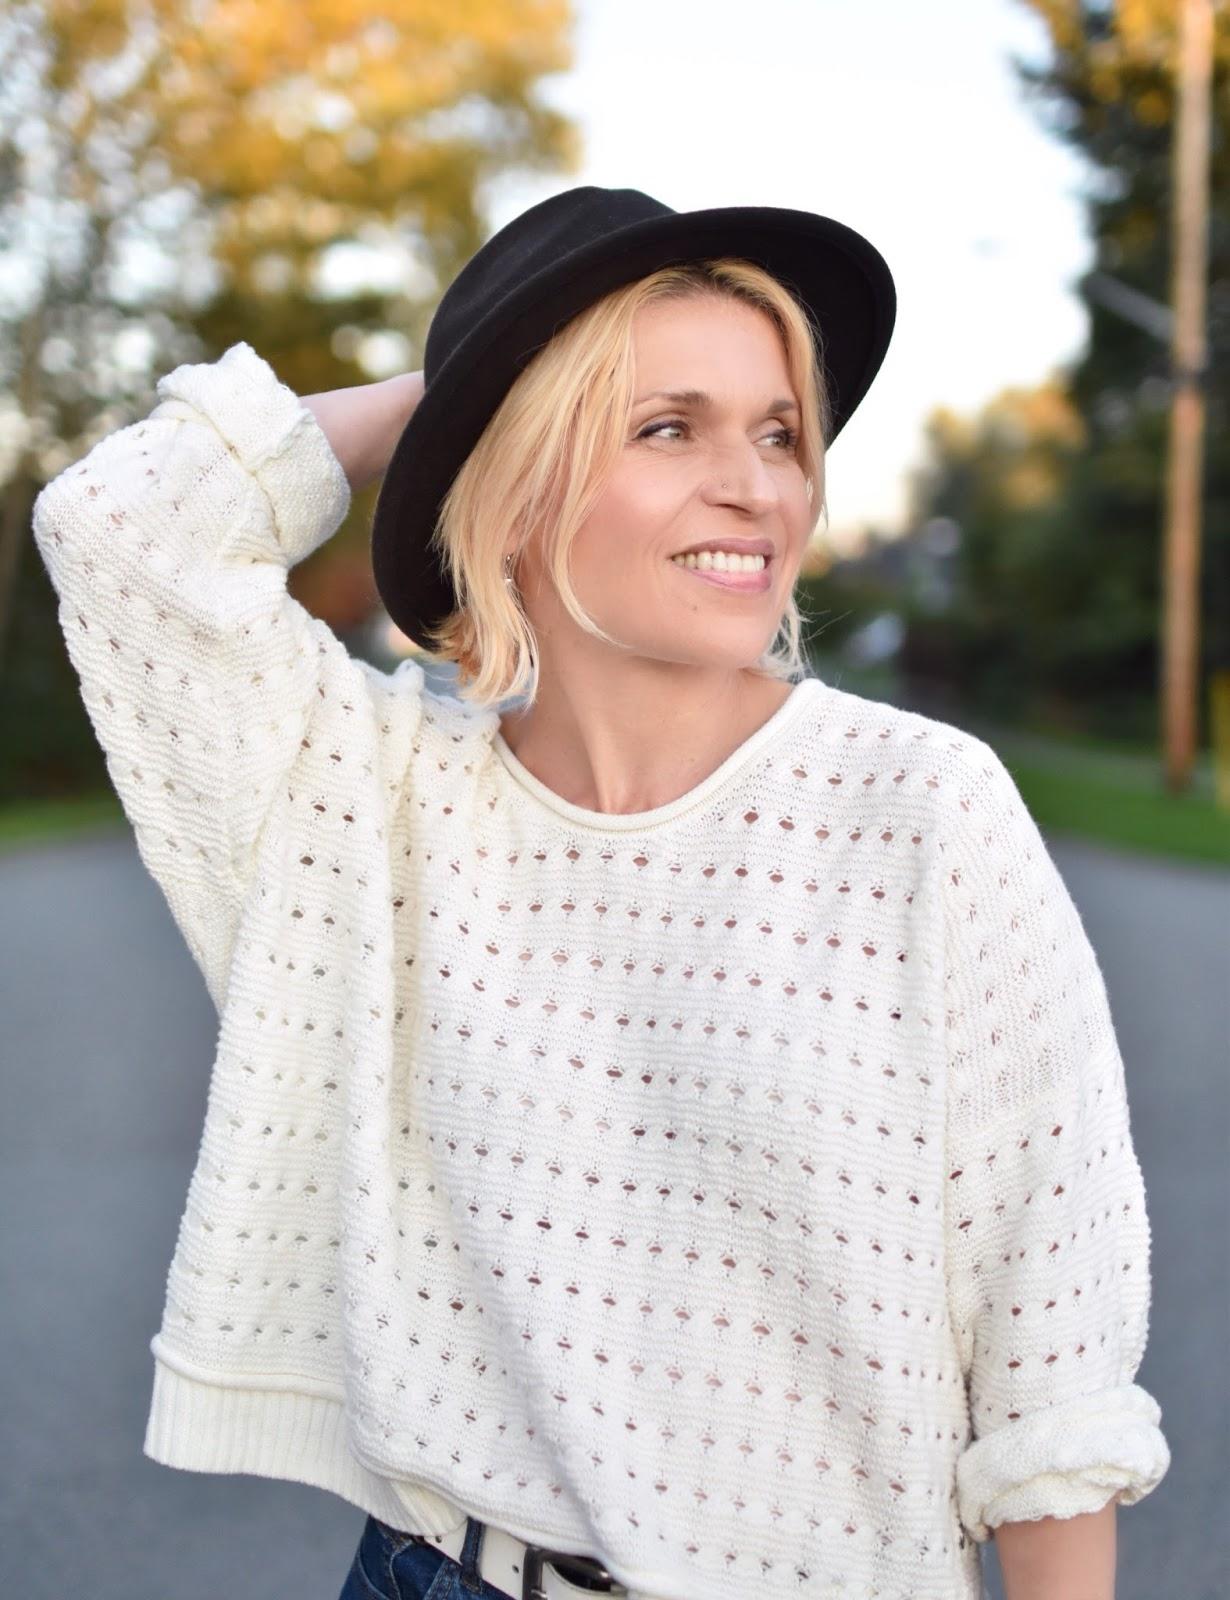 Outfit inspiration c/o Monika Faulkner - white sweater, felt fedora